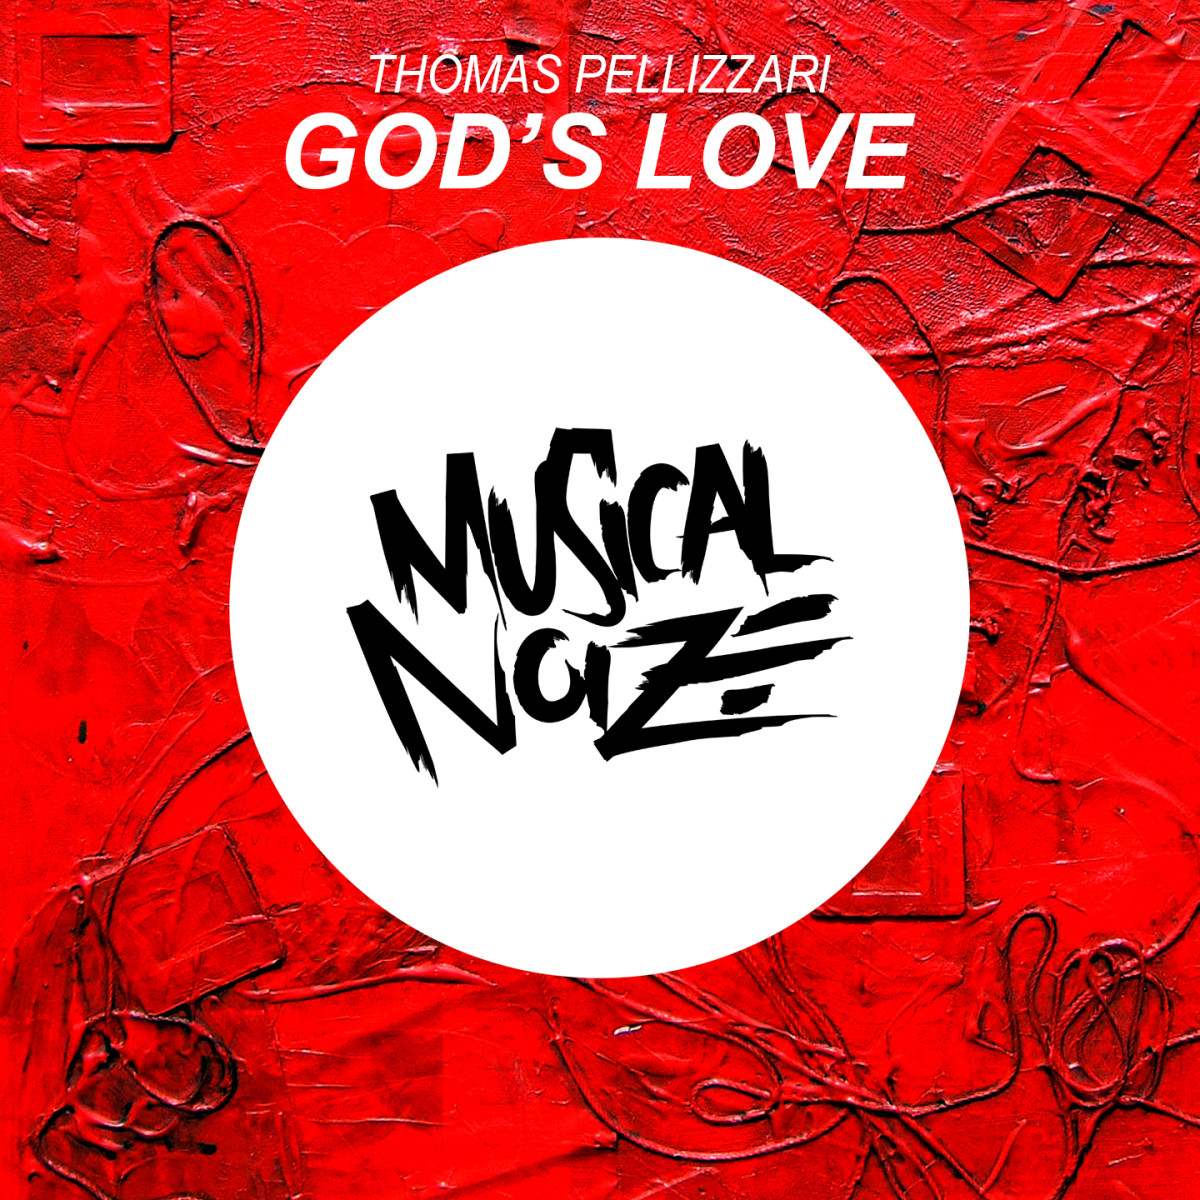 GOD'S-LOVE